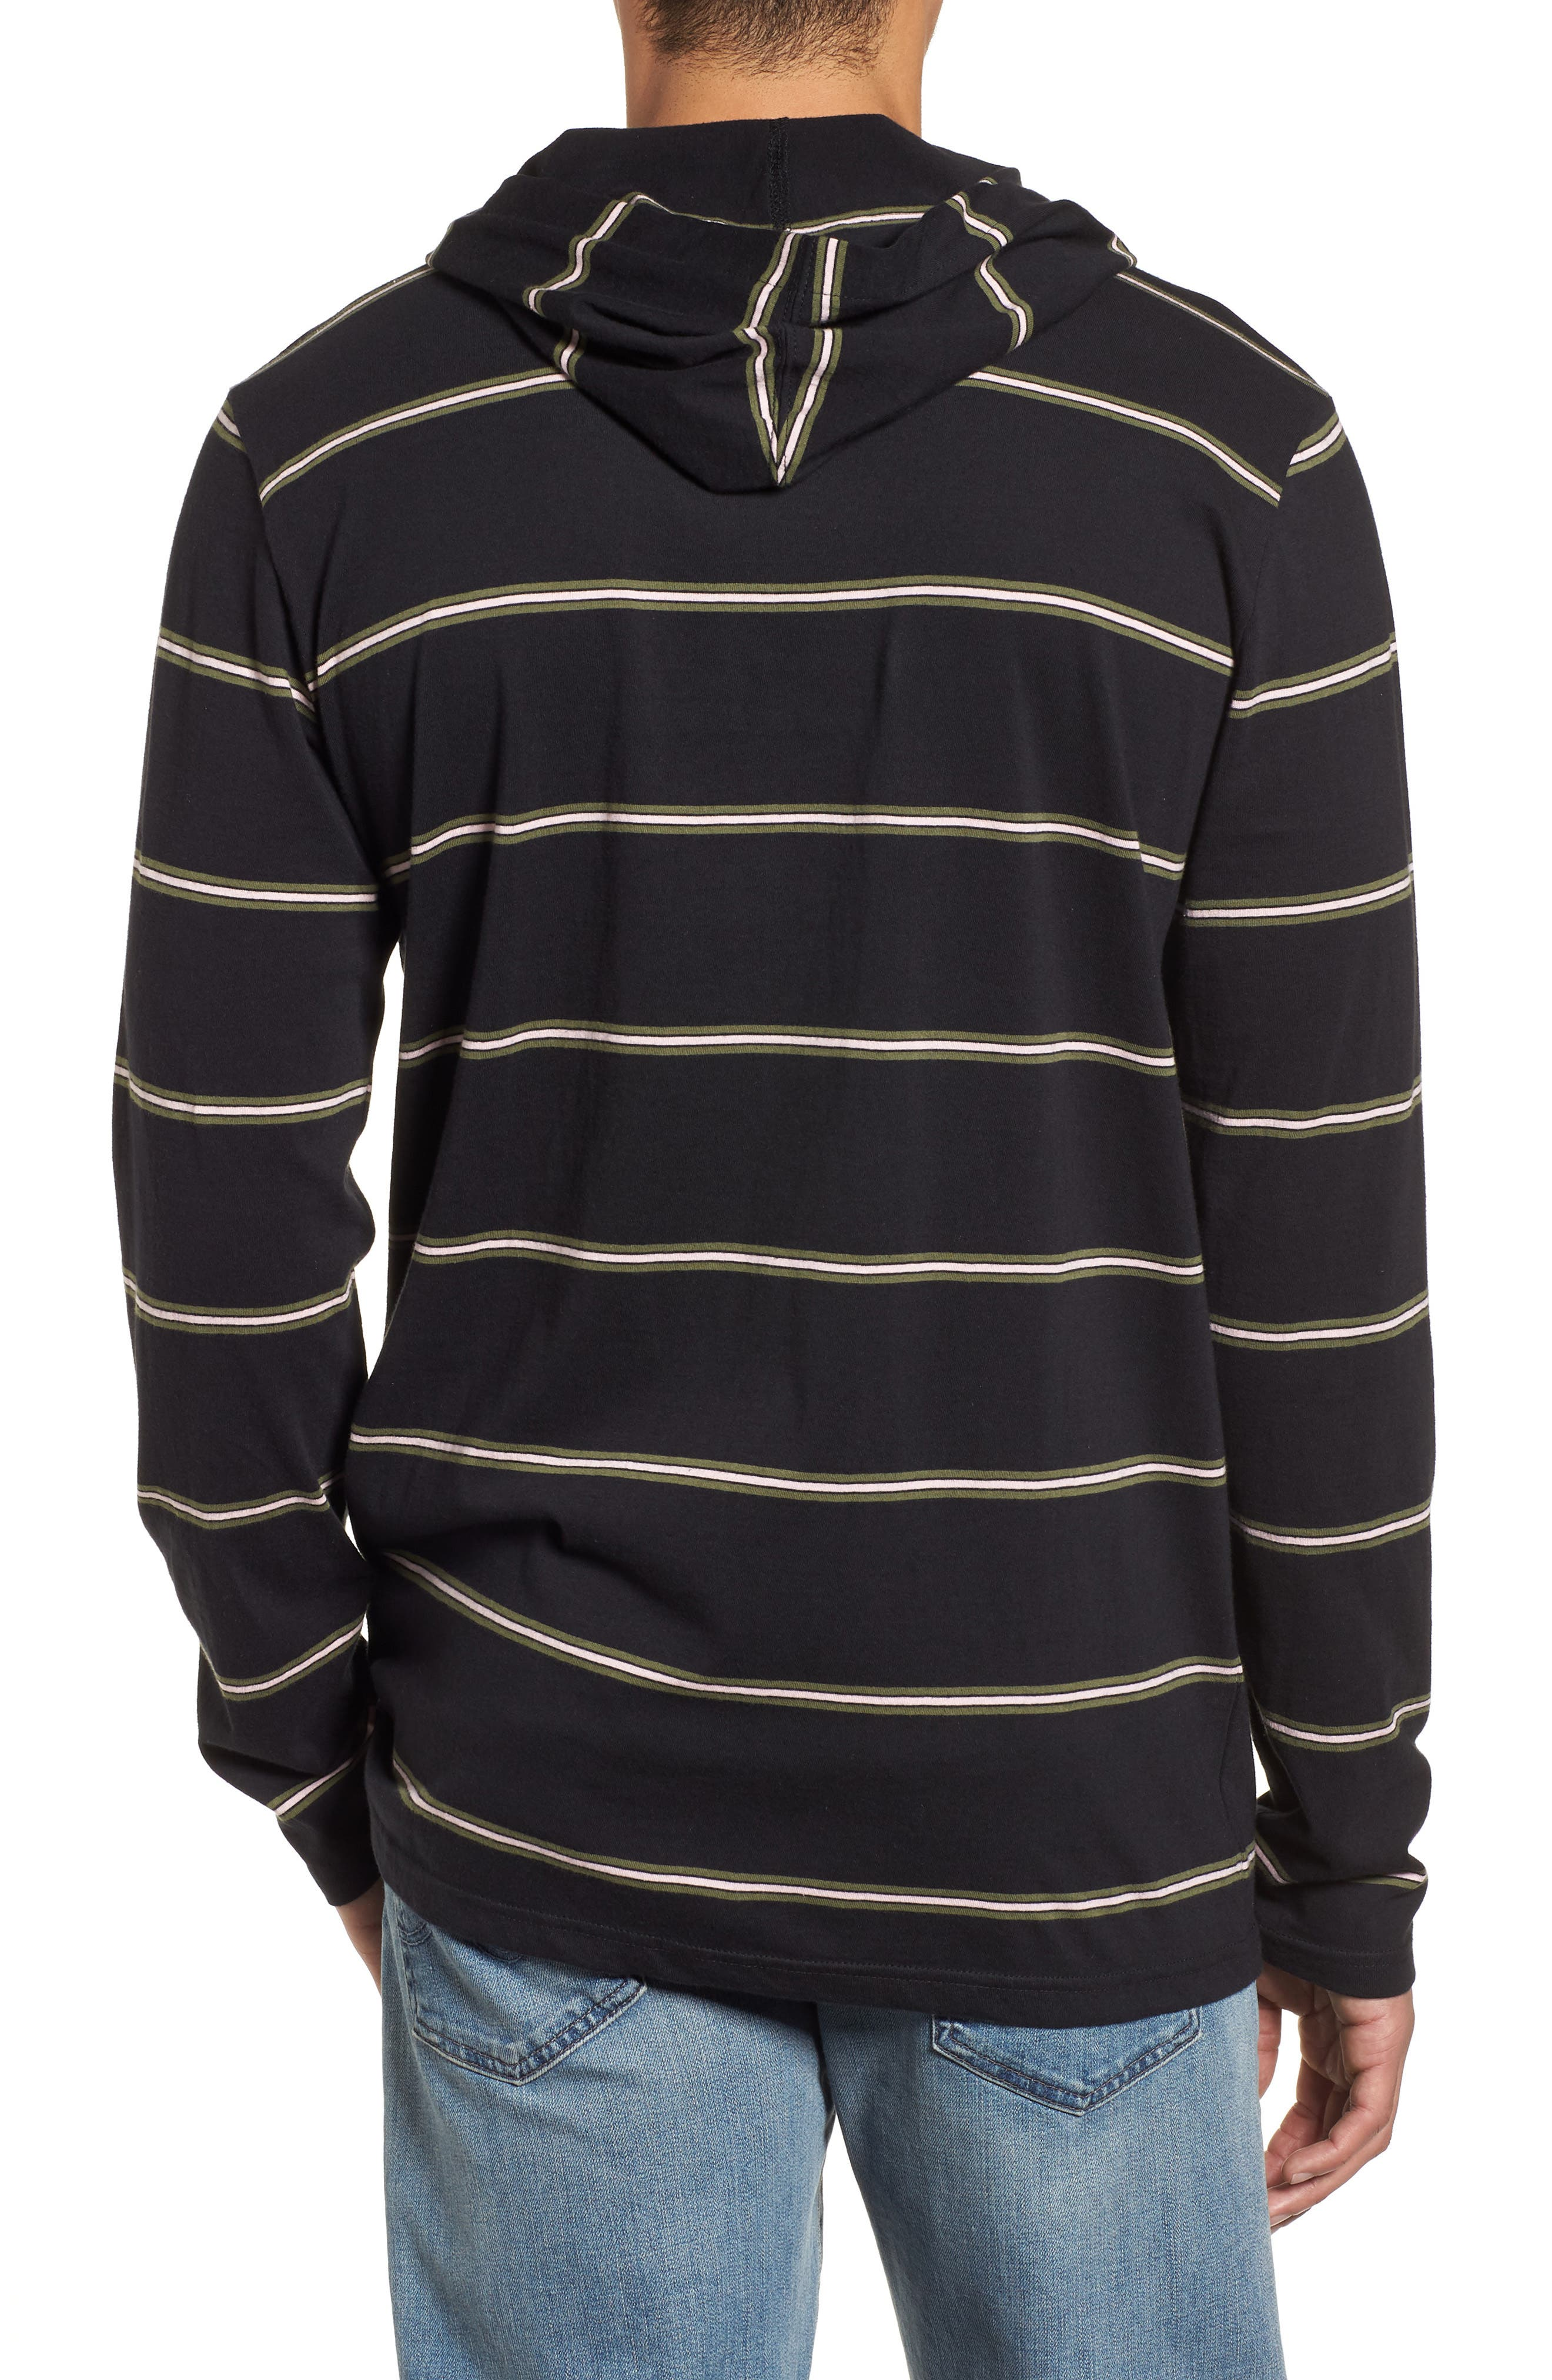 Die Cut Hooded Long Sleeve T-Shirt,                             Alternate thumbnail 2, color,                             001